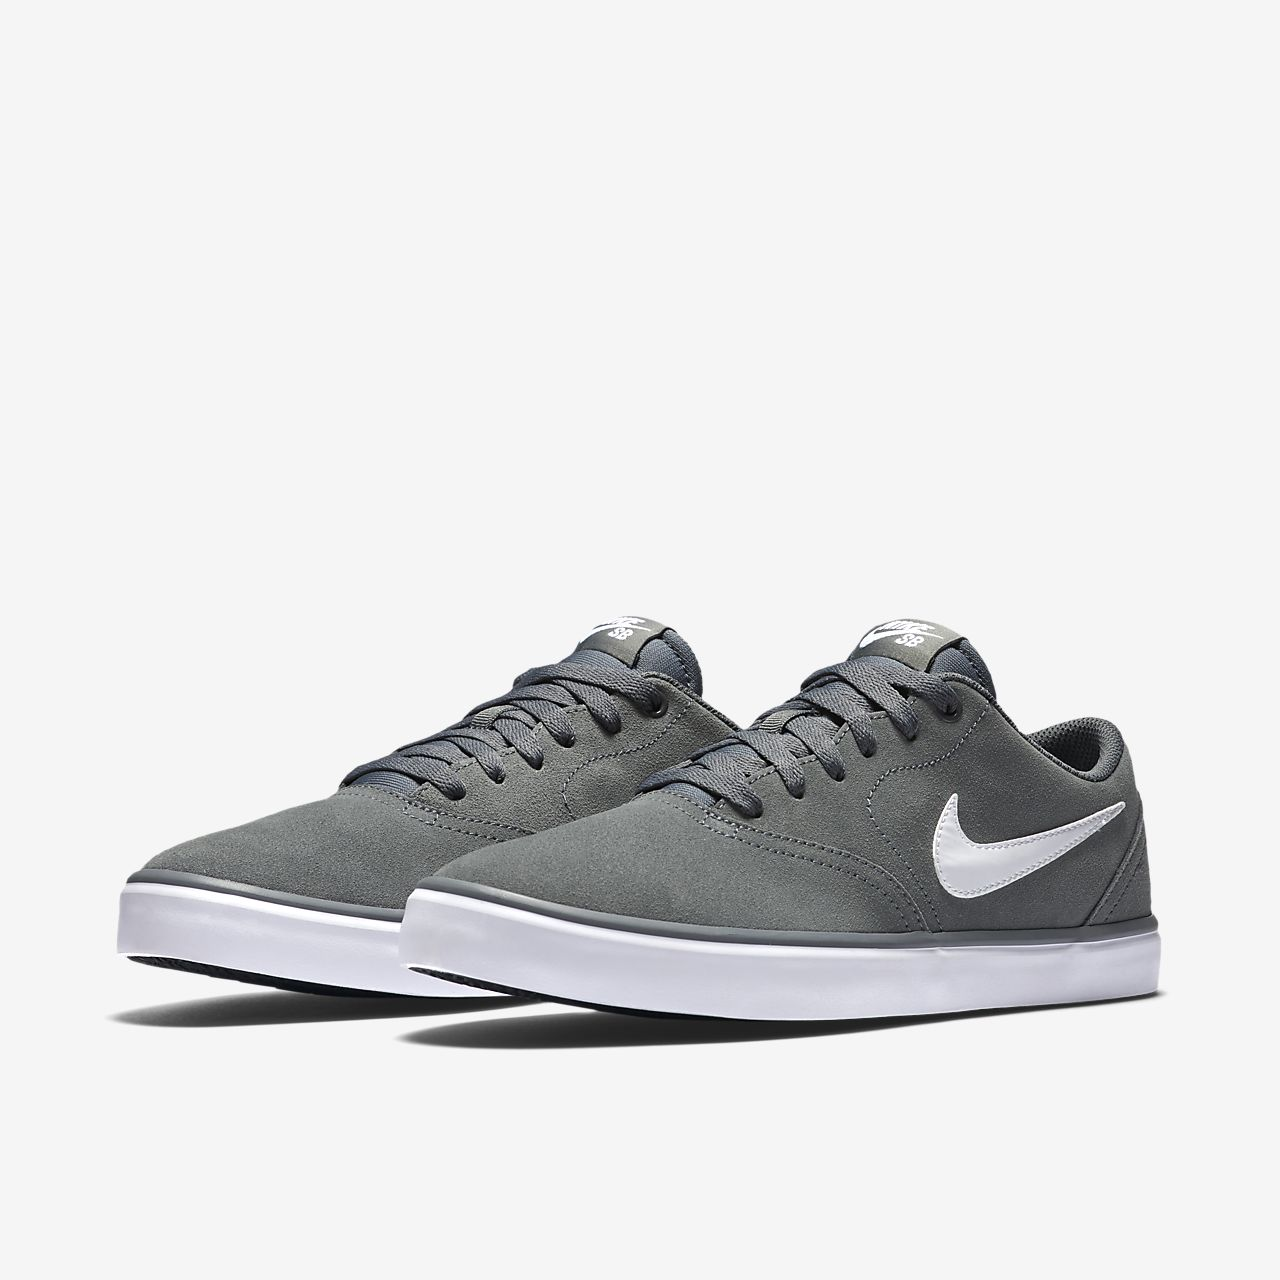 Nike SB Charge Suede Sko Cool GreyWhite Cool Grey White